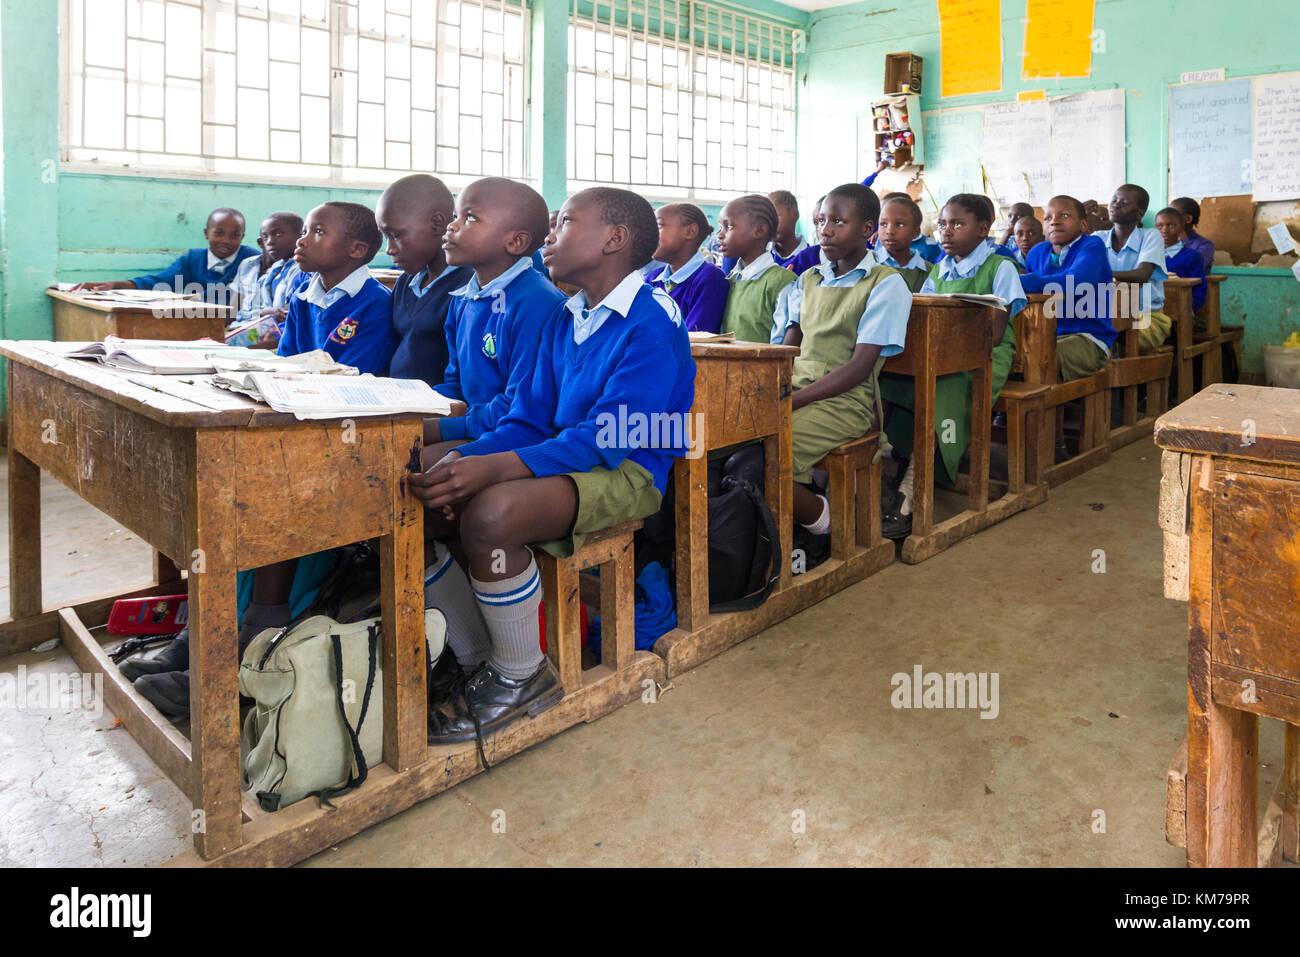 Secondary school children in uniform sat at desks listening to their teacher during class, Nairobi, Kenya - Stock Image